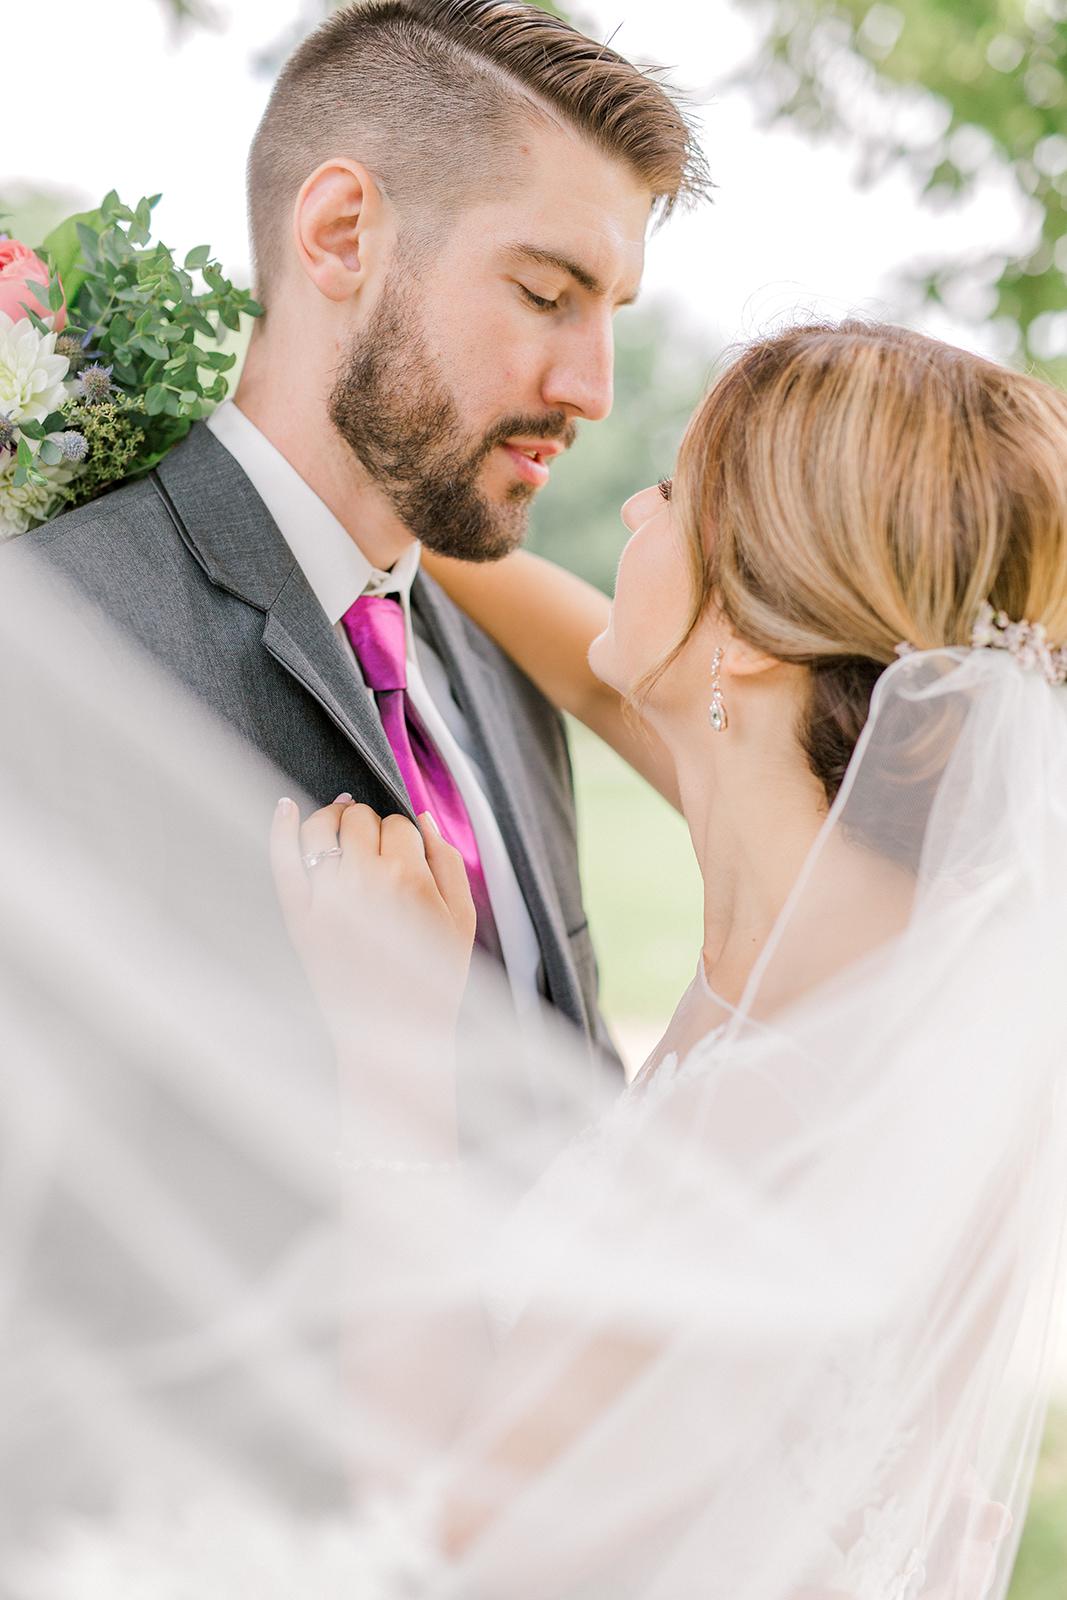 Ushers_Ferry_Cedar_Rapids_Wedding_Ella+Phil-0602.jpg